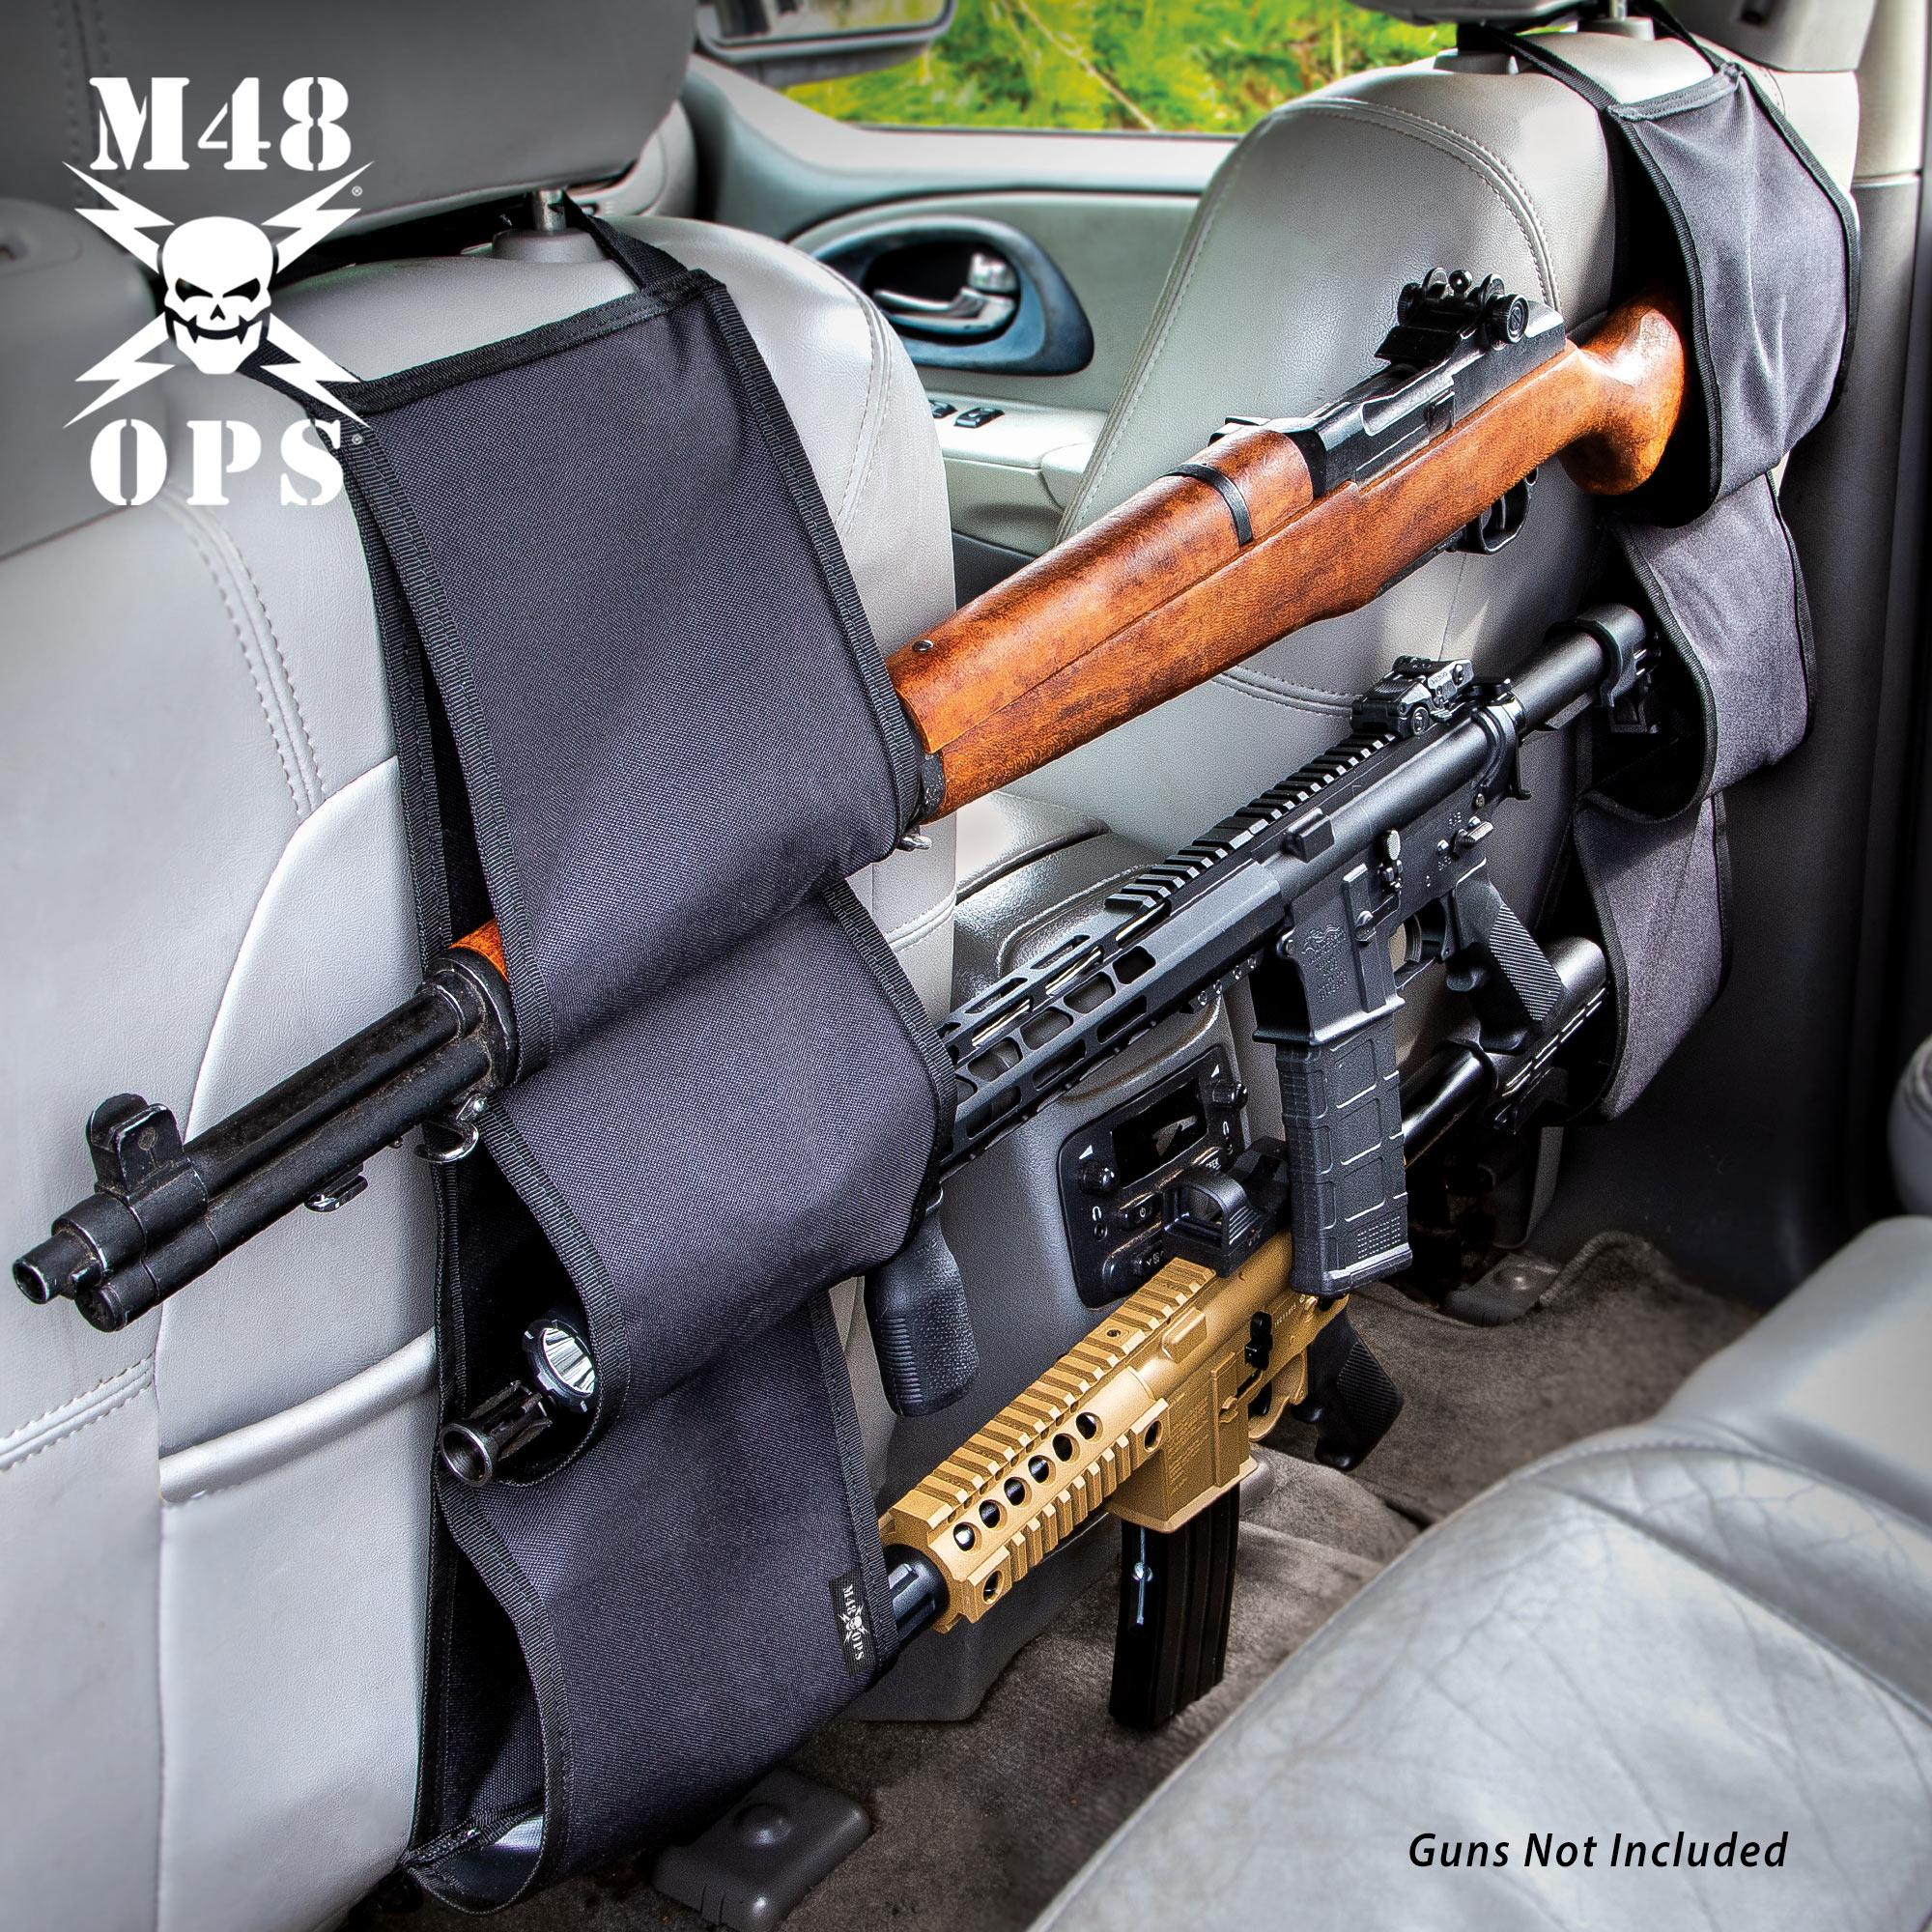 M48 Backseat Gun Rifle Rack Car Truck Storage Carrier Case Holder Hunting Pickup Ebay